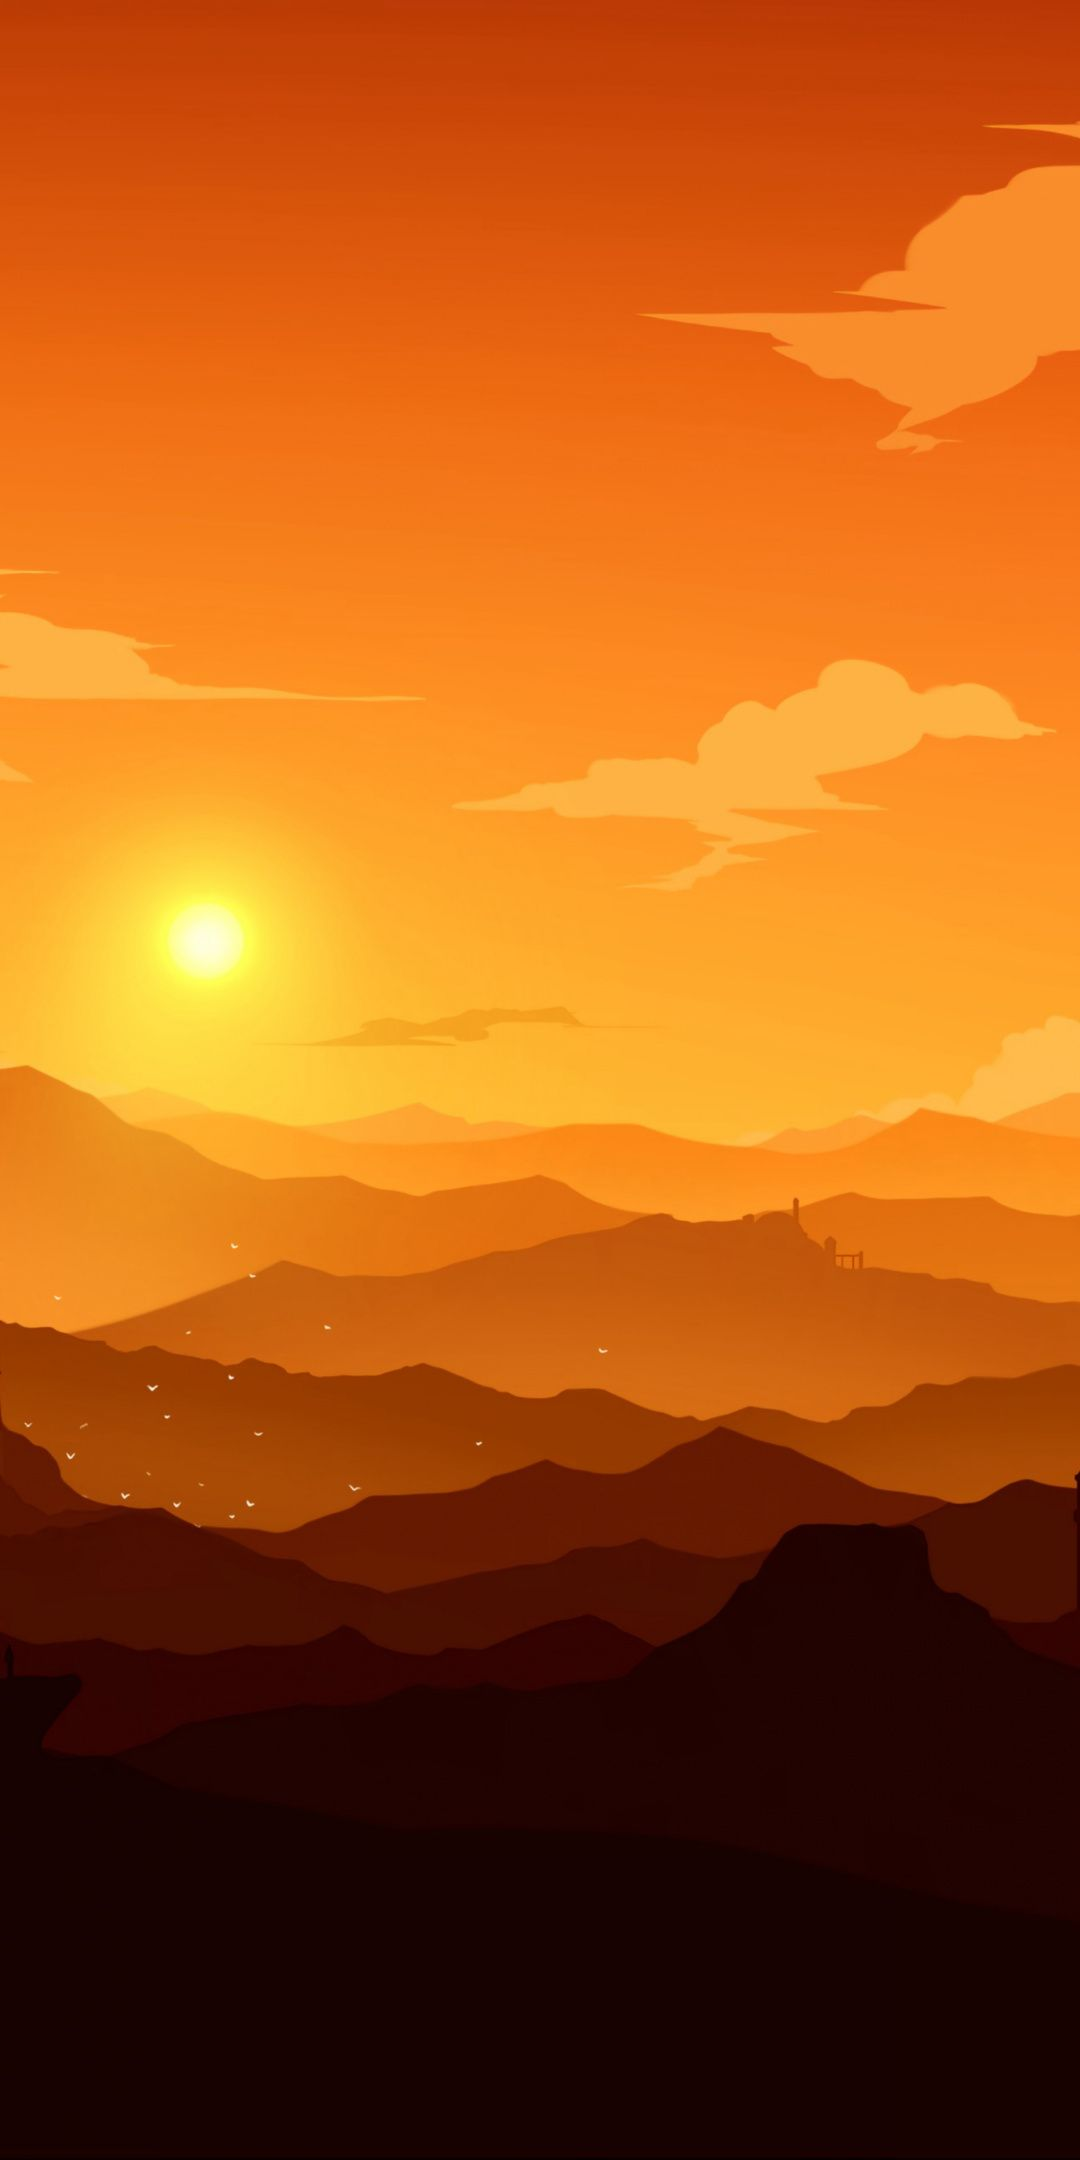 Mountains, horizon, castle, sunset, art, 1080x2160 wallpaper